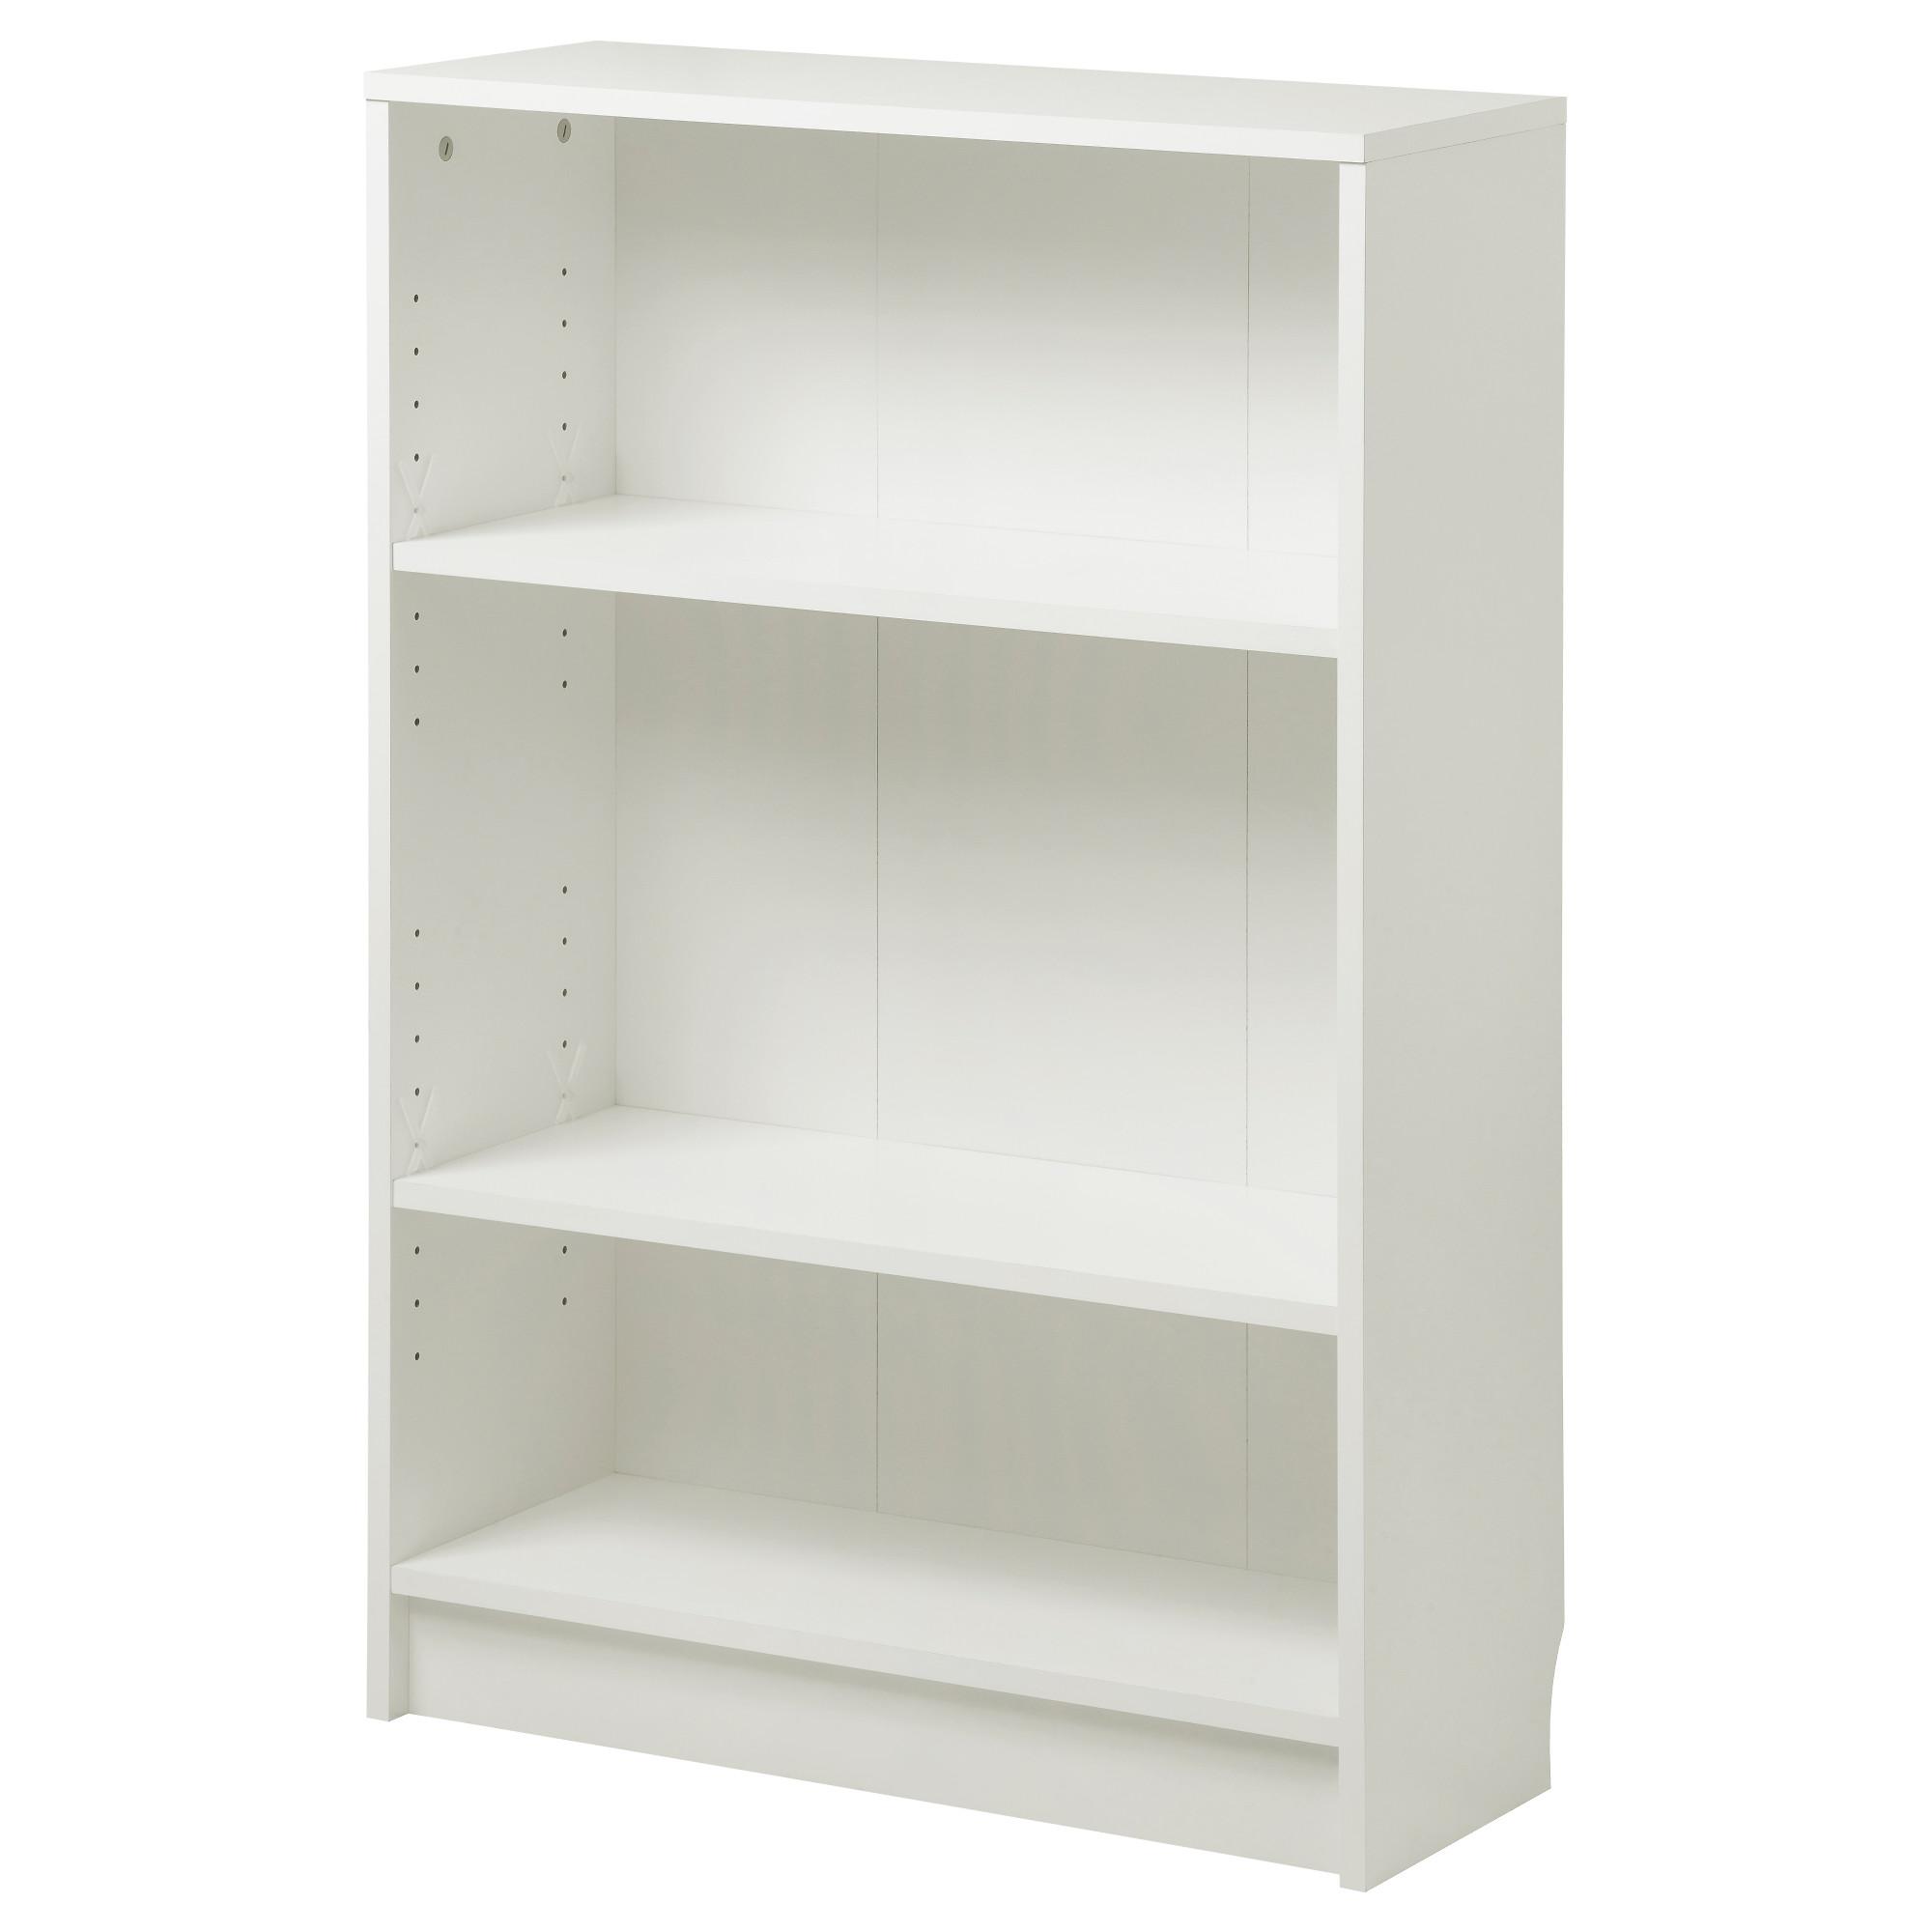 white bookcase avdala bookcase, white width: 25 5/8  IOSMBJD